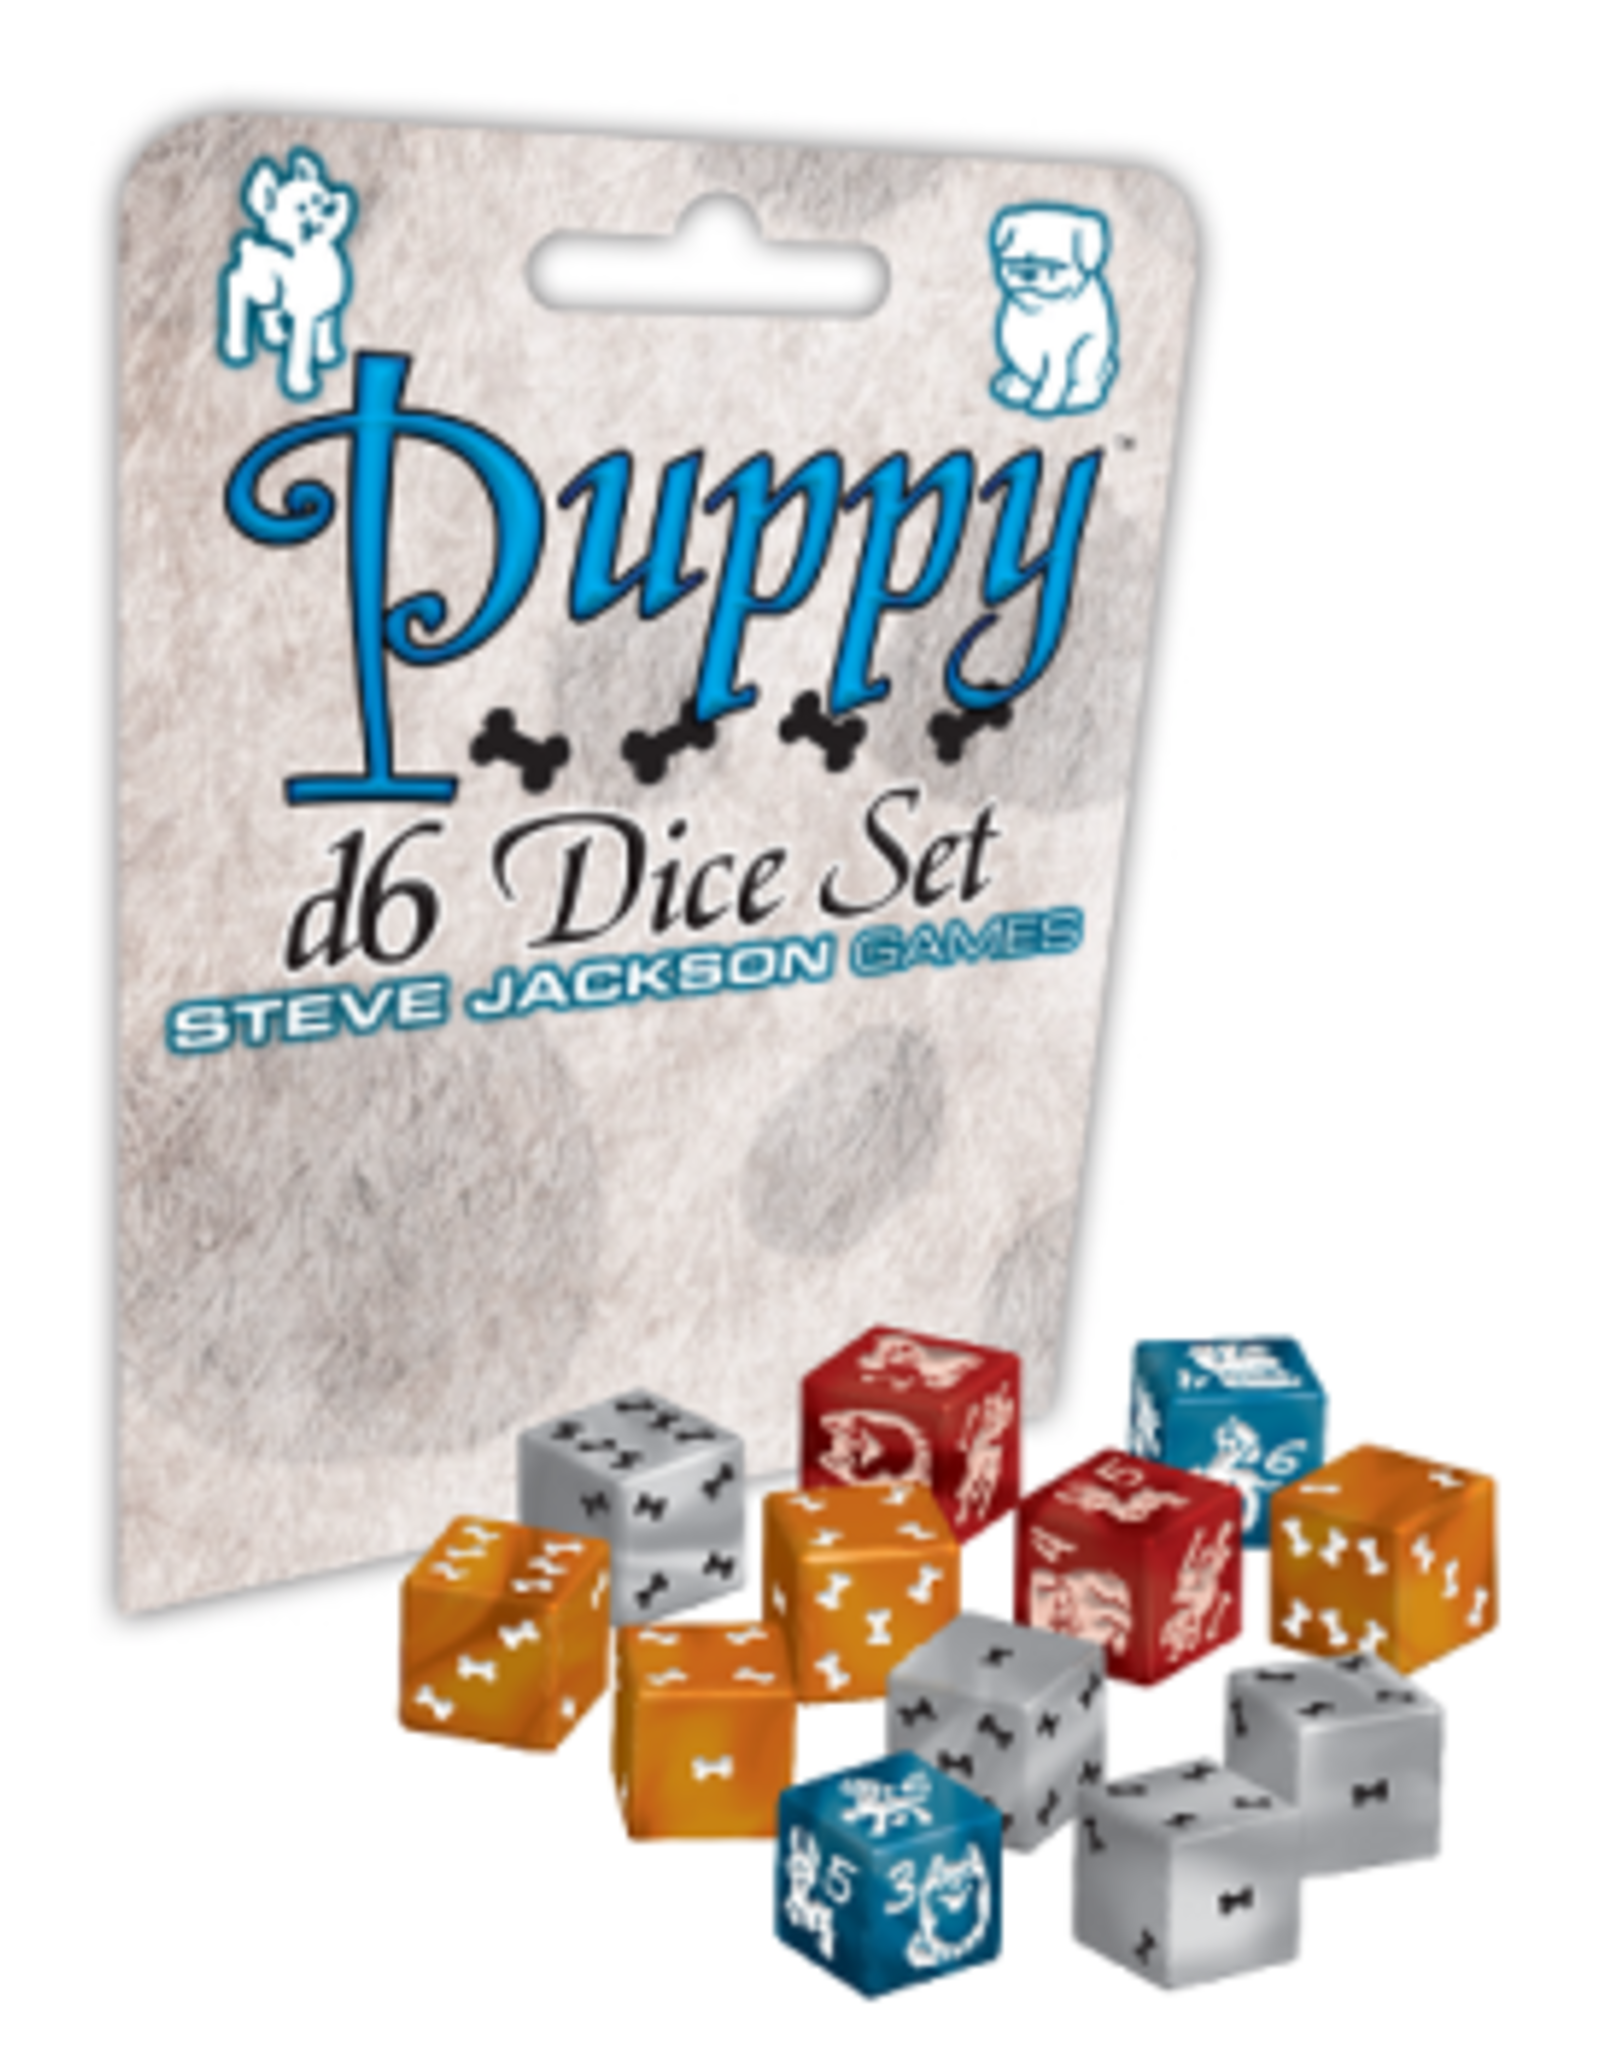 Steve Jackson Games Puppy Dice D6